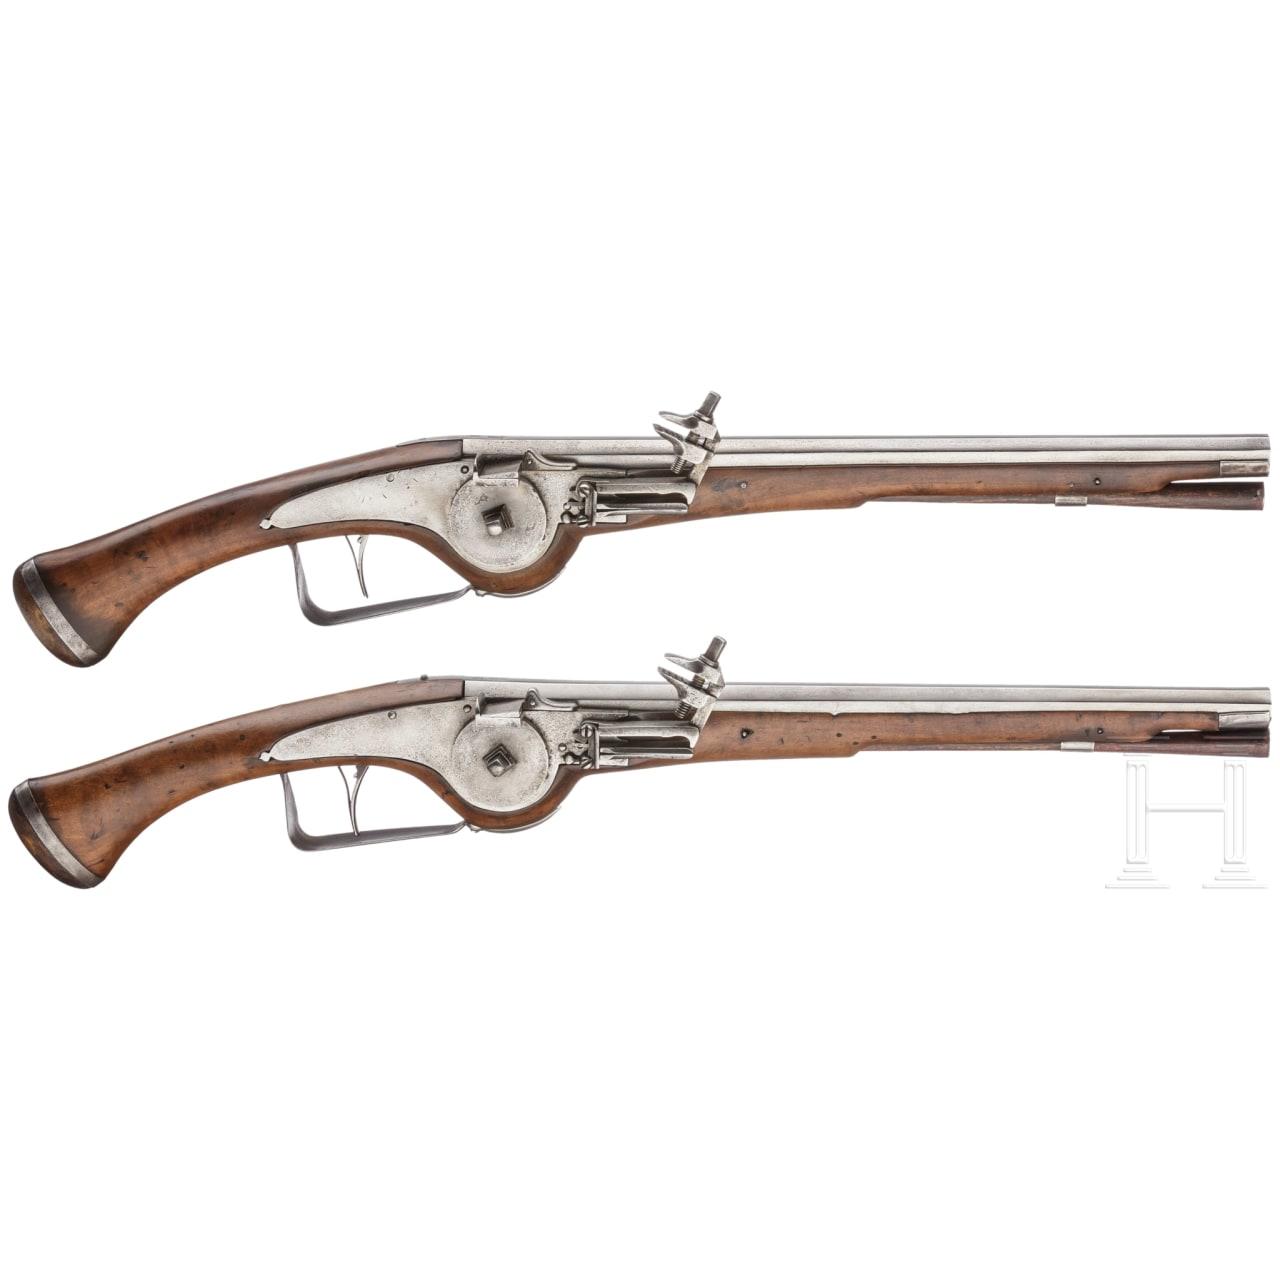 A pair of German military wheellock pistols, circa 1630/40